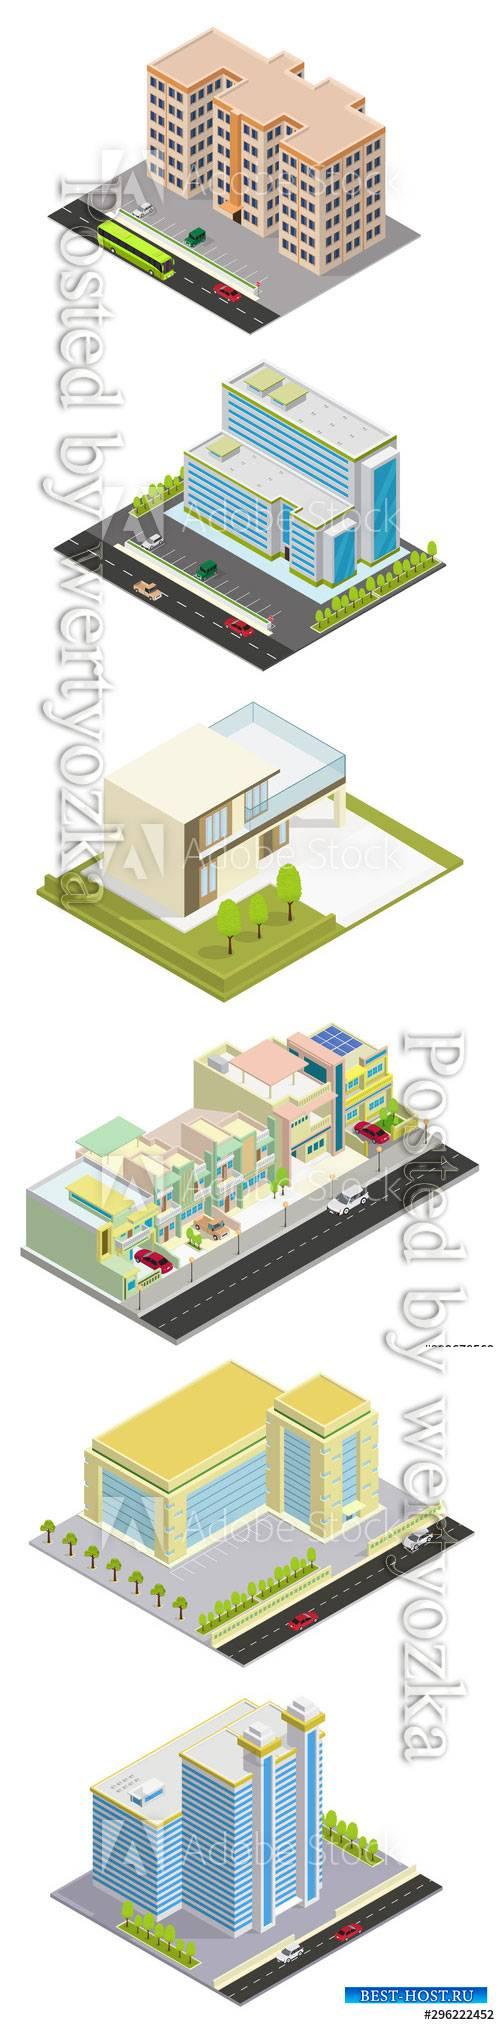 Vector isometric hotel, apartment, or skyscraper building